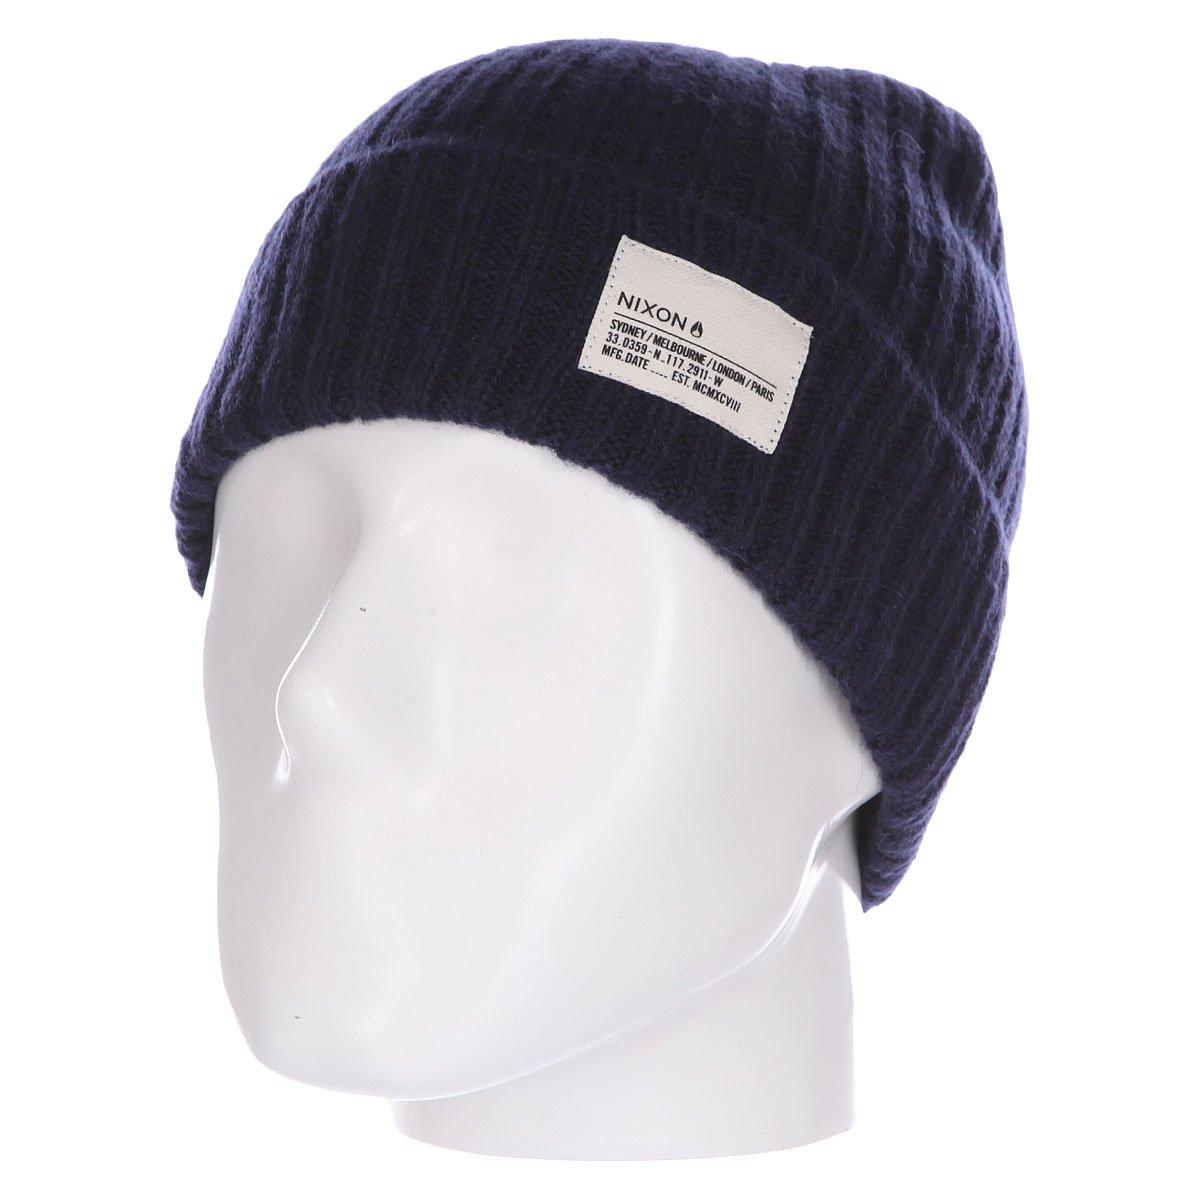 79766603a0a70 Купить шапку Nixon Marshall Beanie Navy Heather в интернет-магазине  Proskater.by